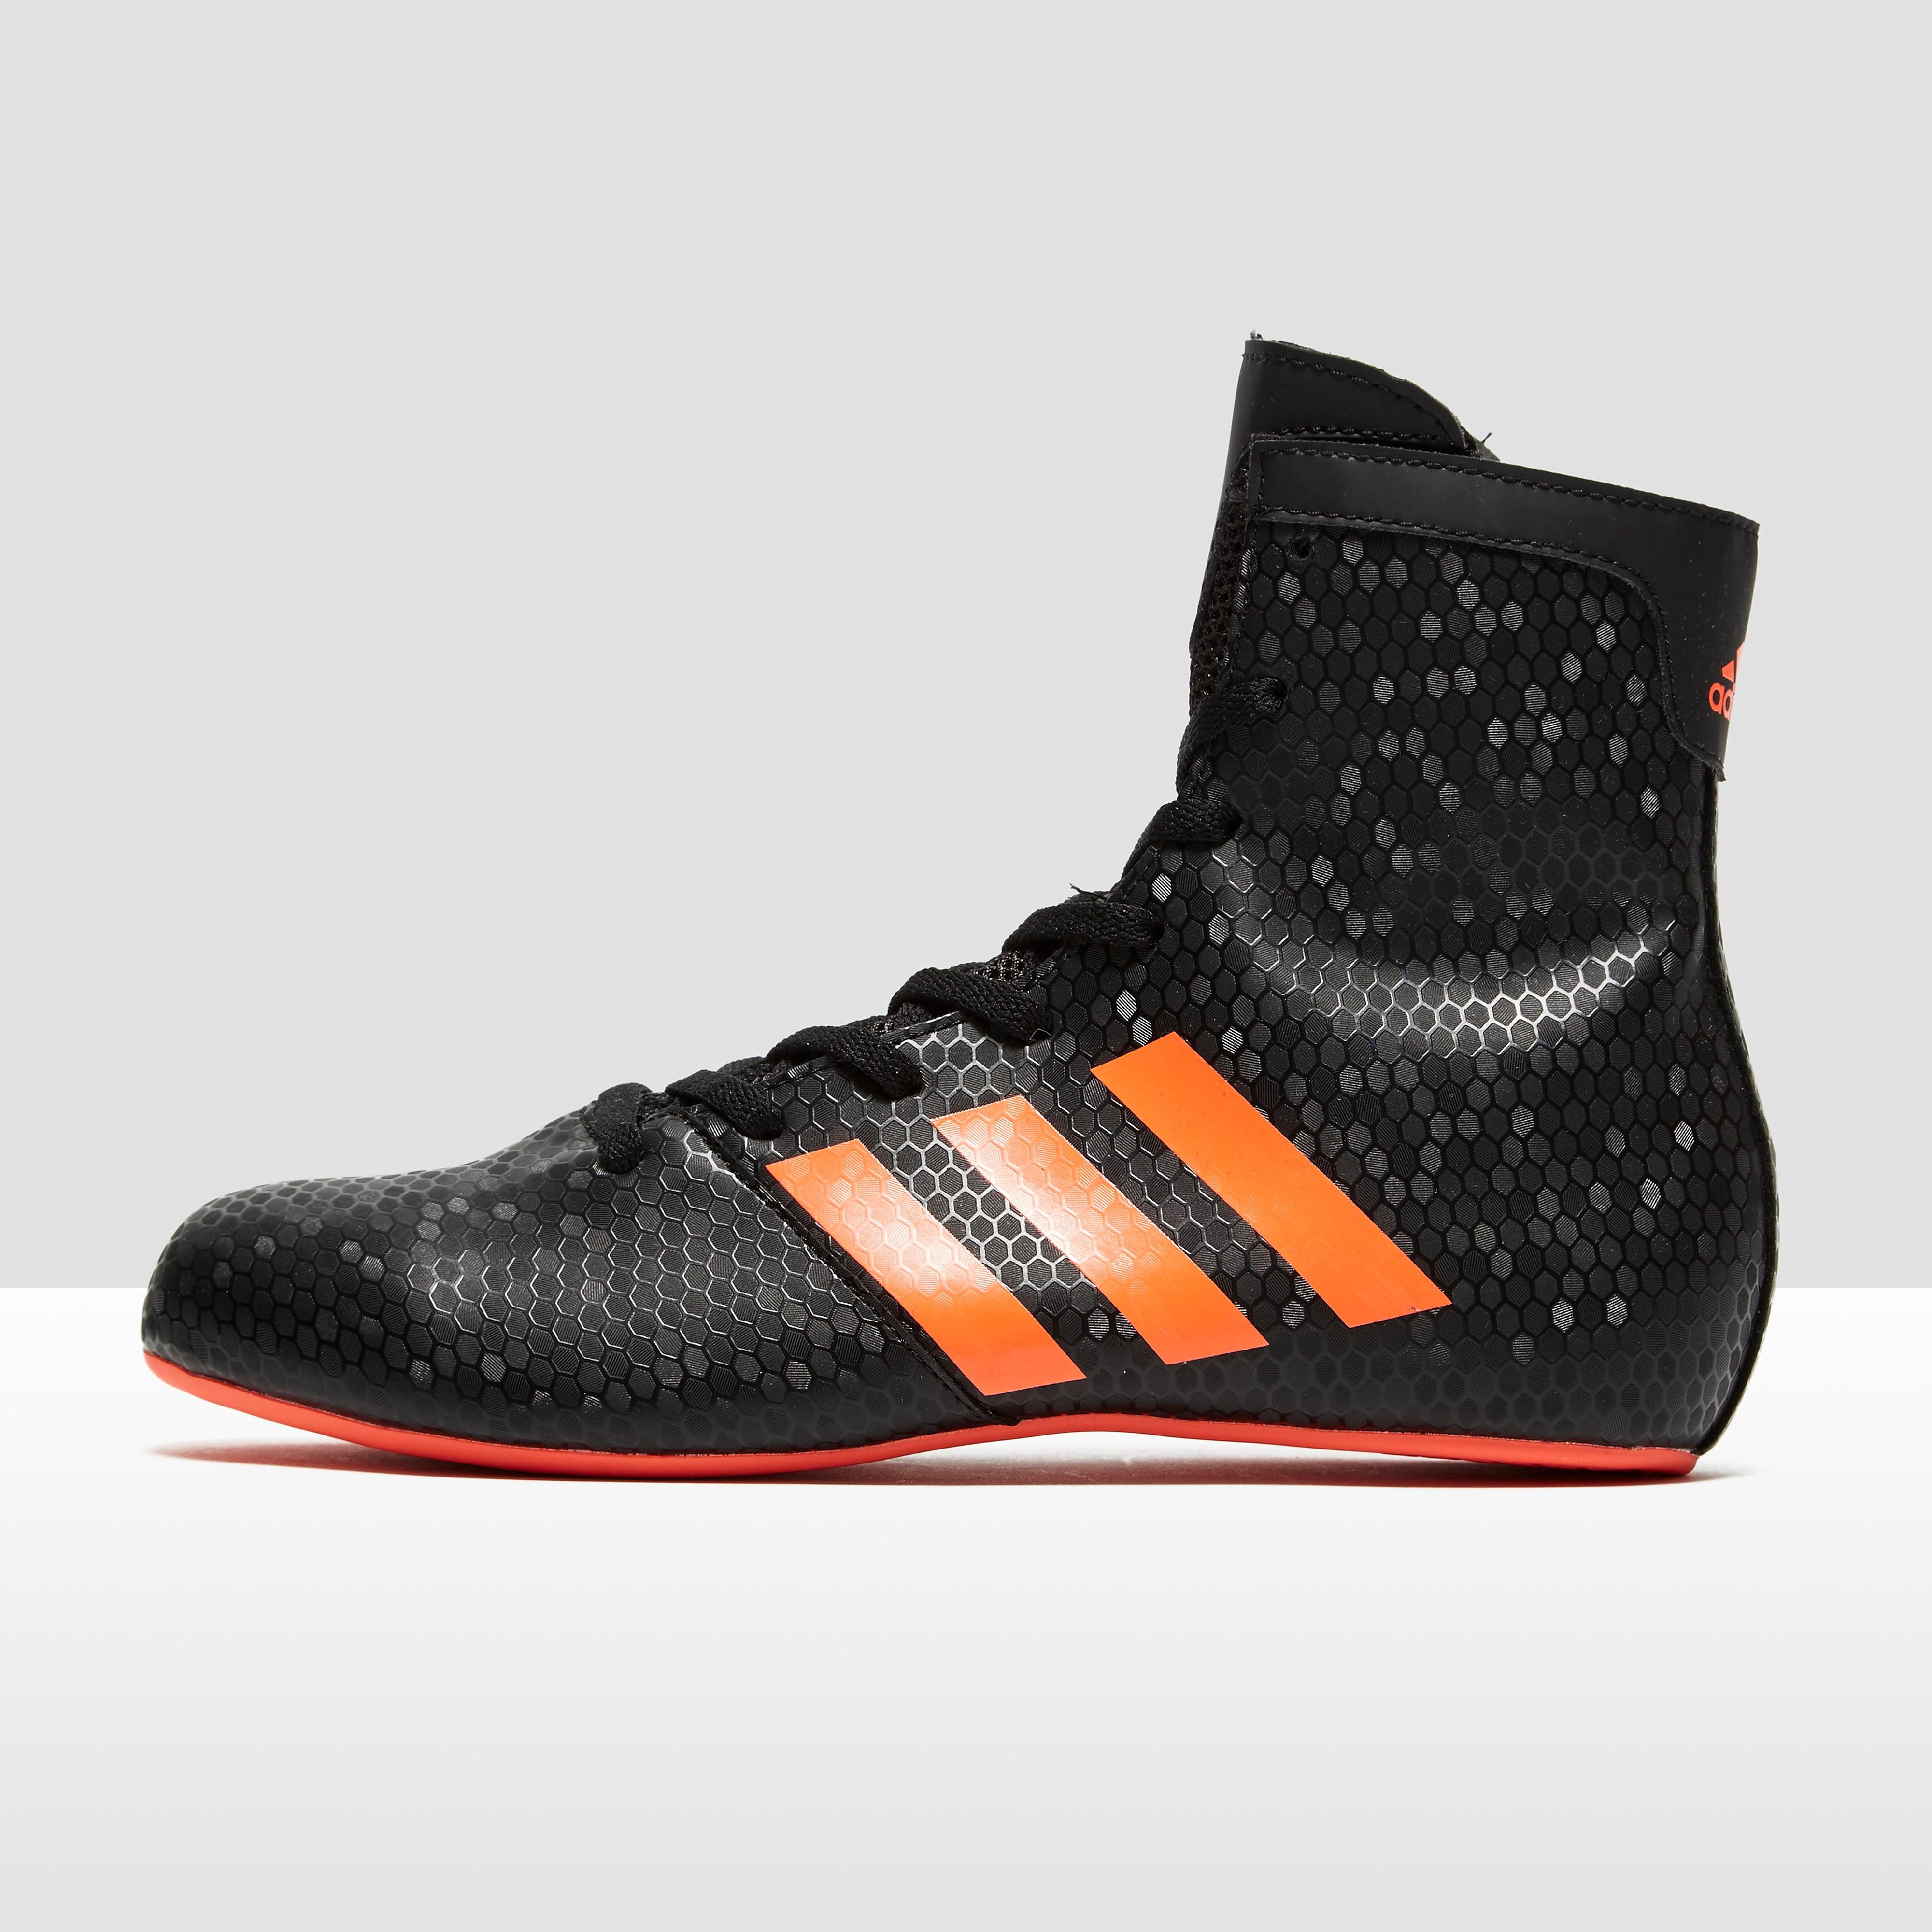 adidas KO Legend 16.2 Junior Boxing Boots